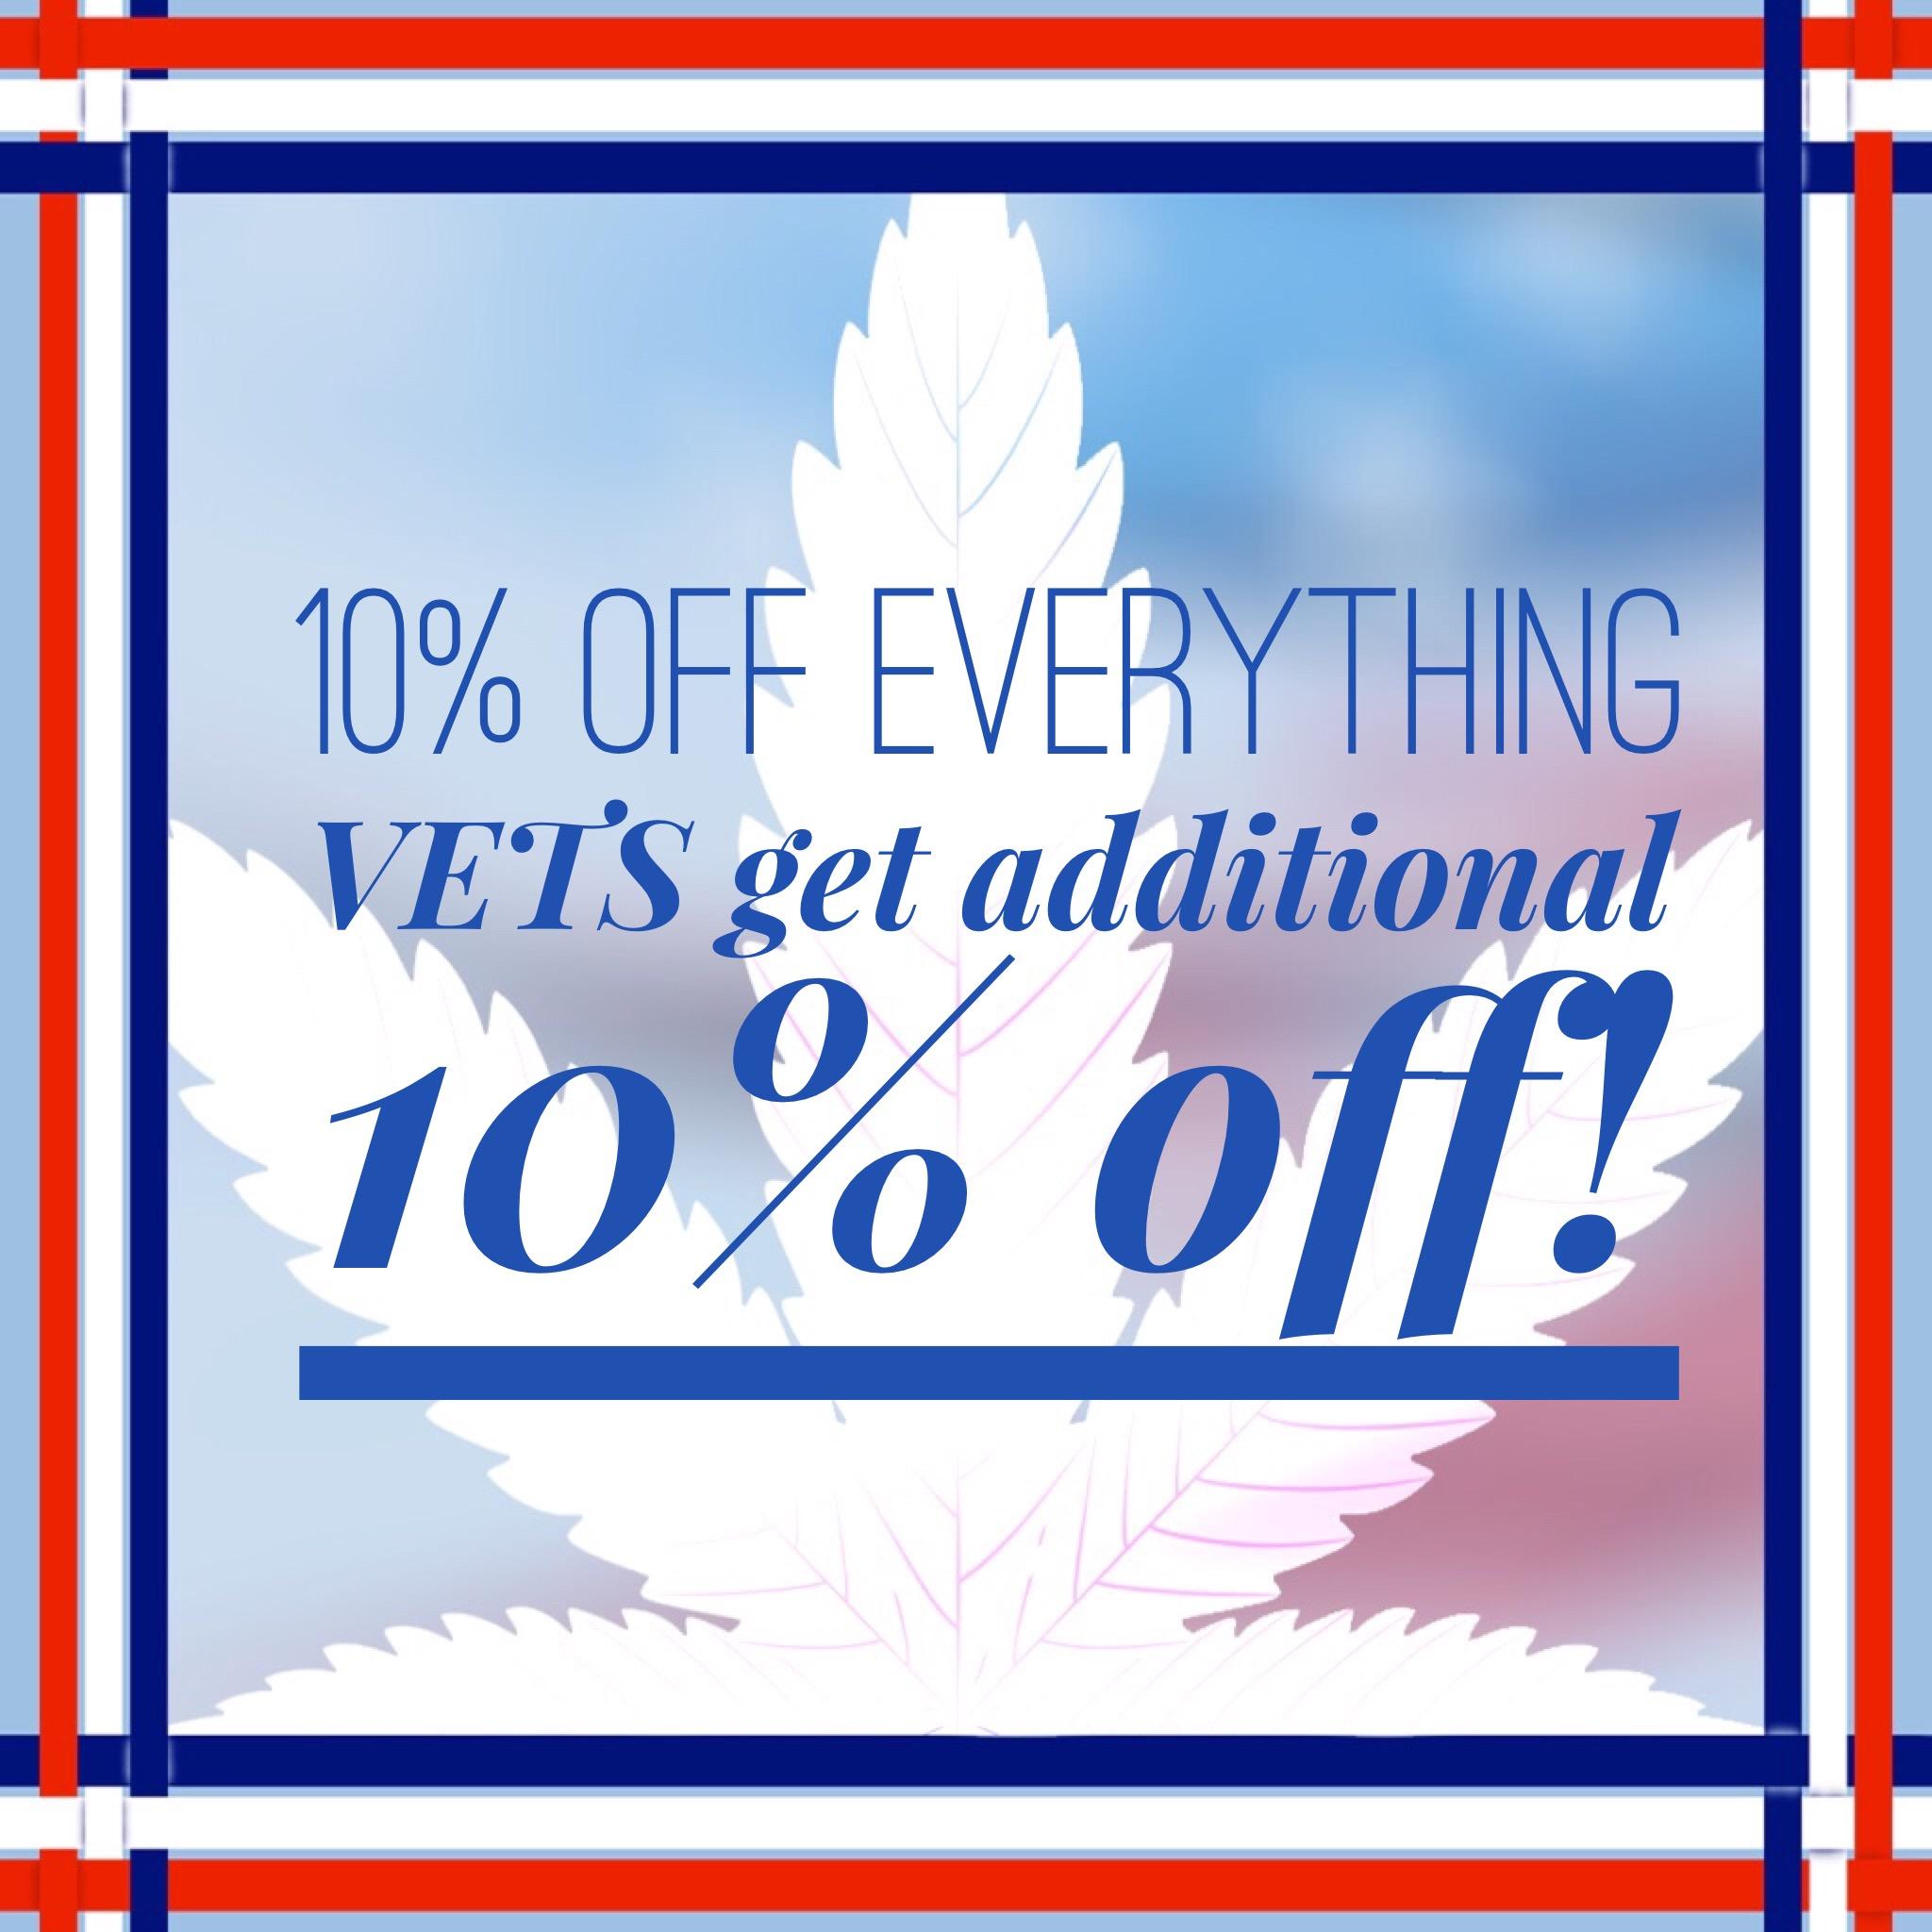 Vet-discounts-marijuana.jpg